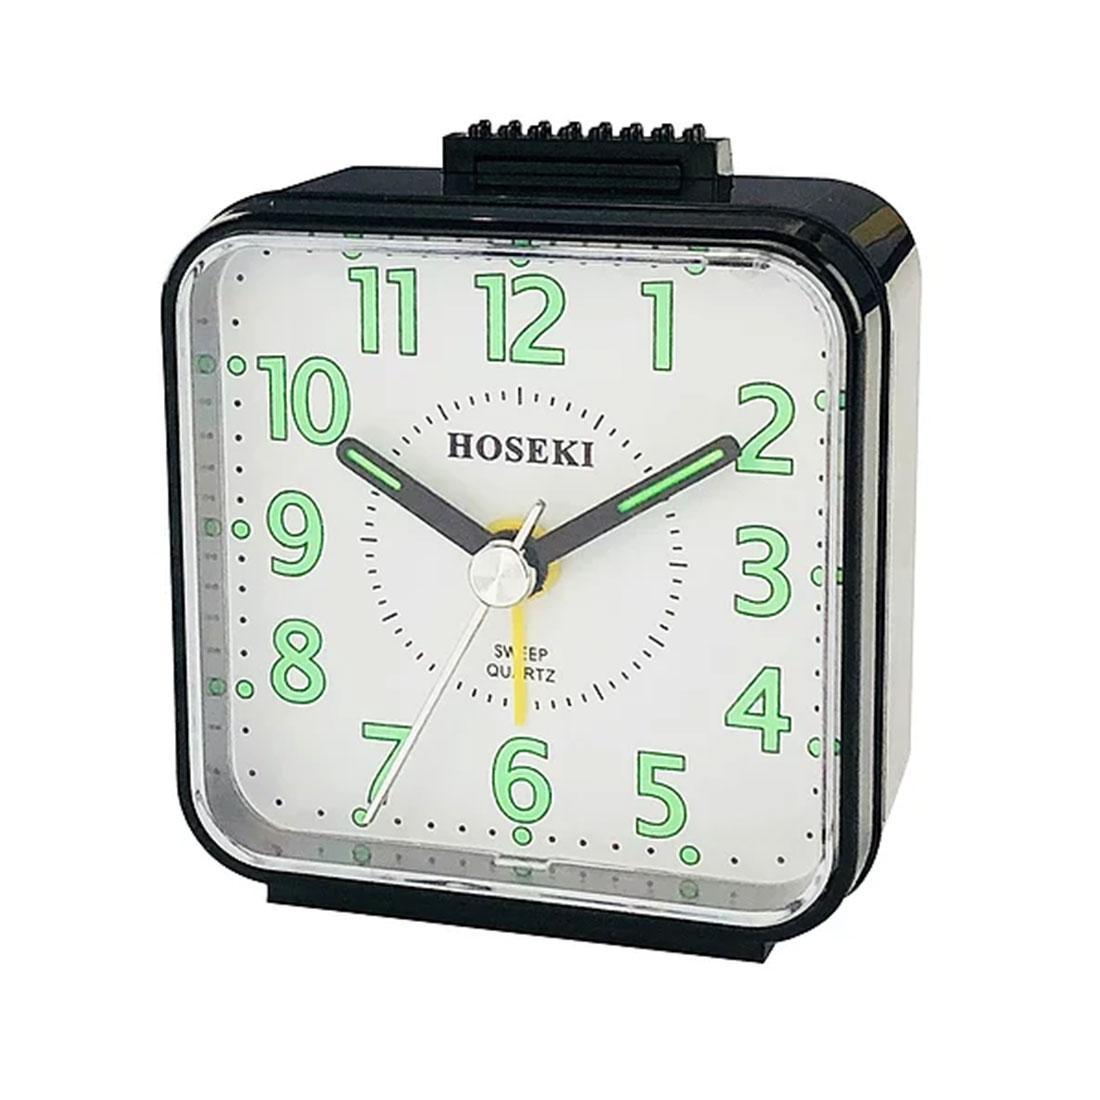 Hoseki Sweep Quartz Black White Square Analog Beep Alarm Clock H-9064BK/W H-9064